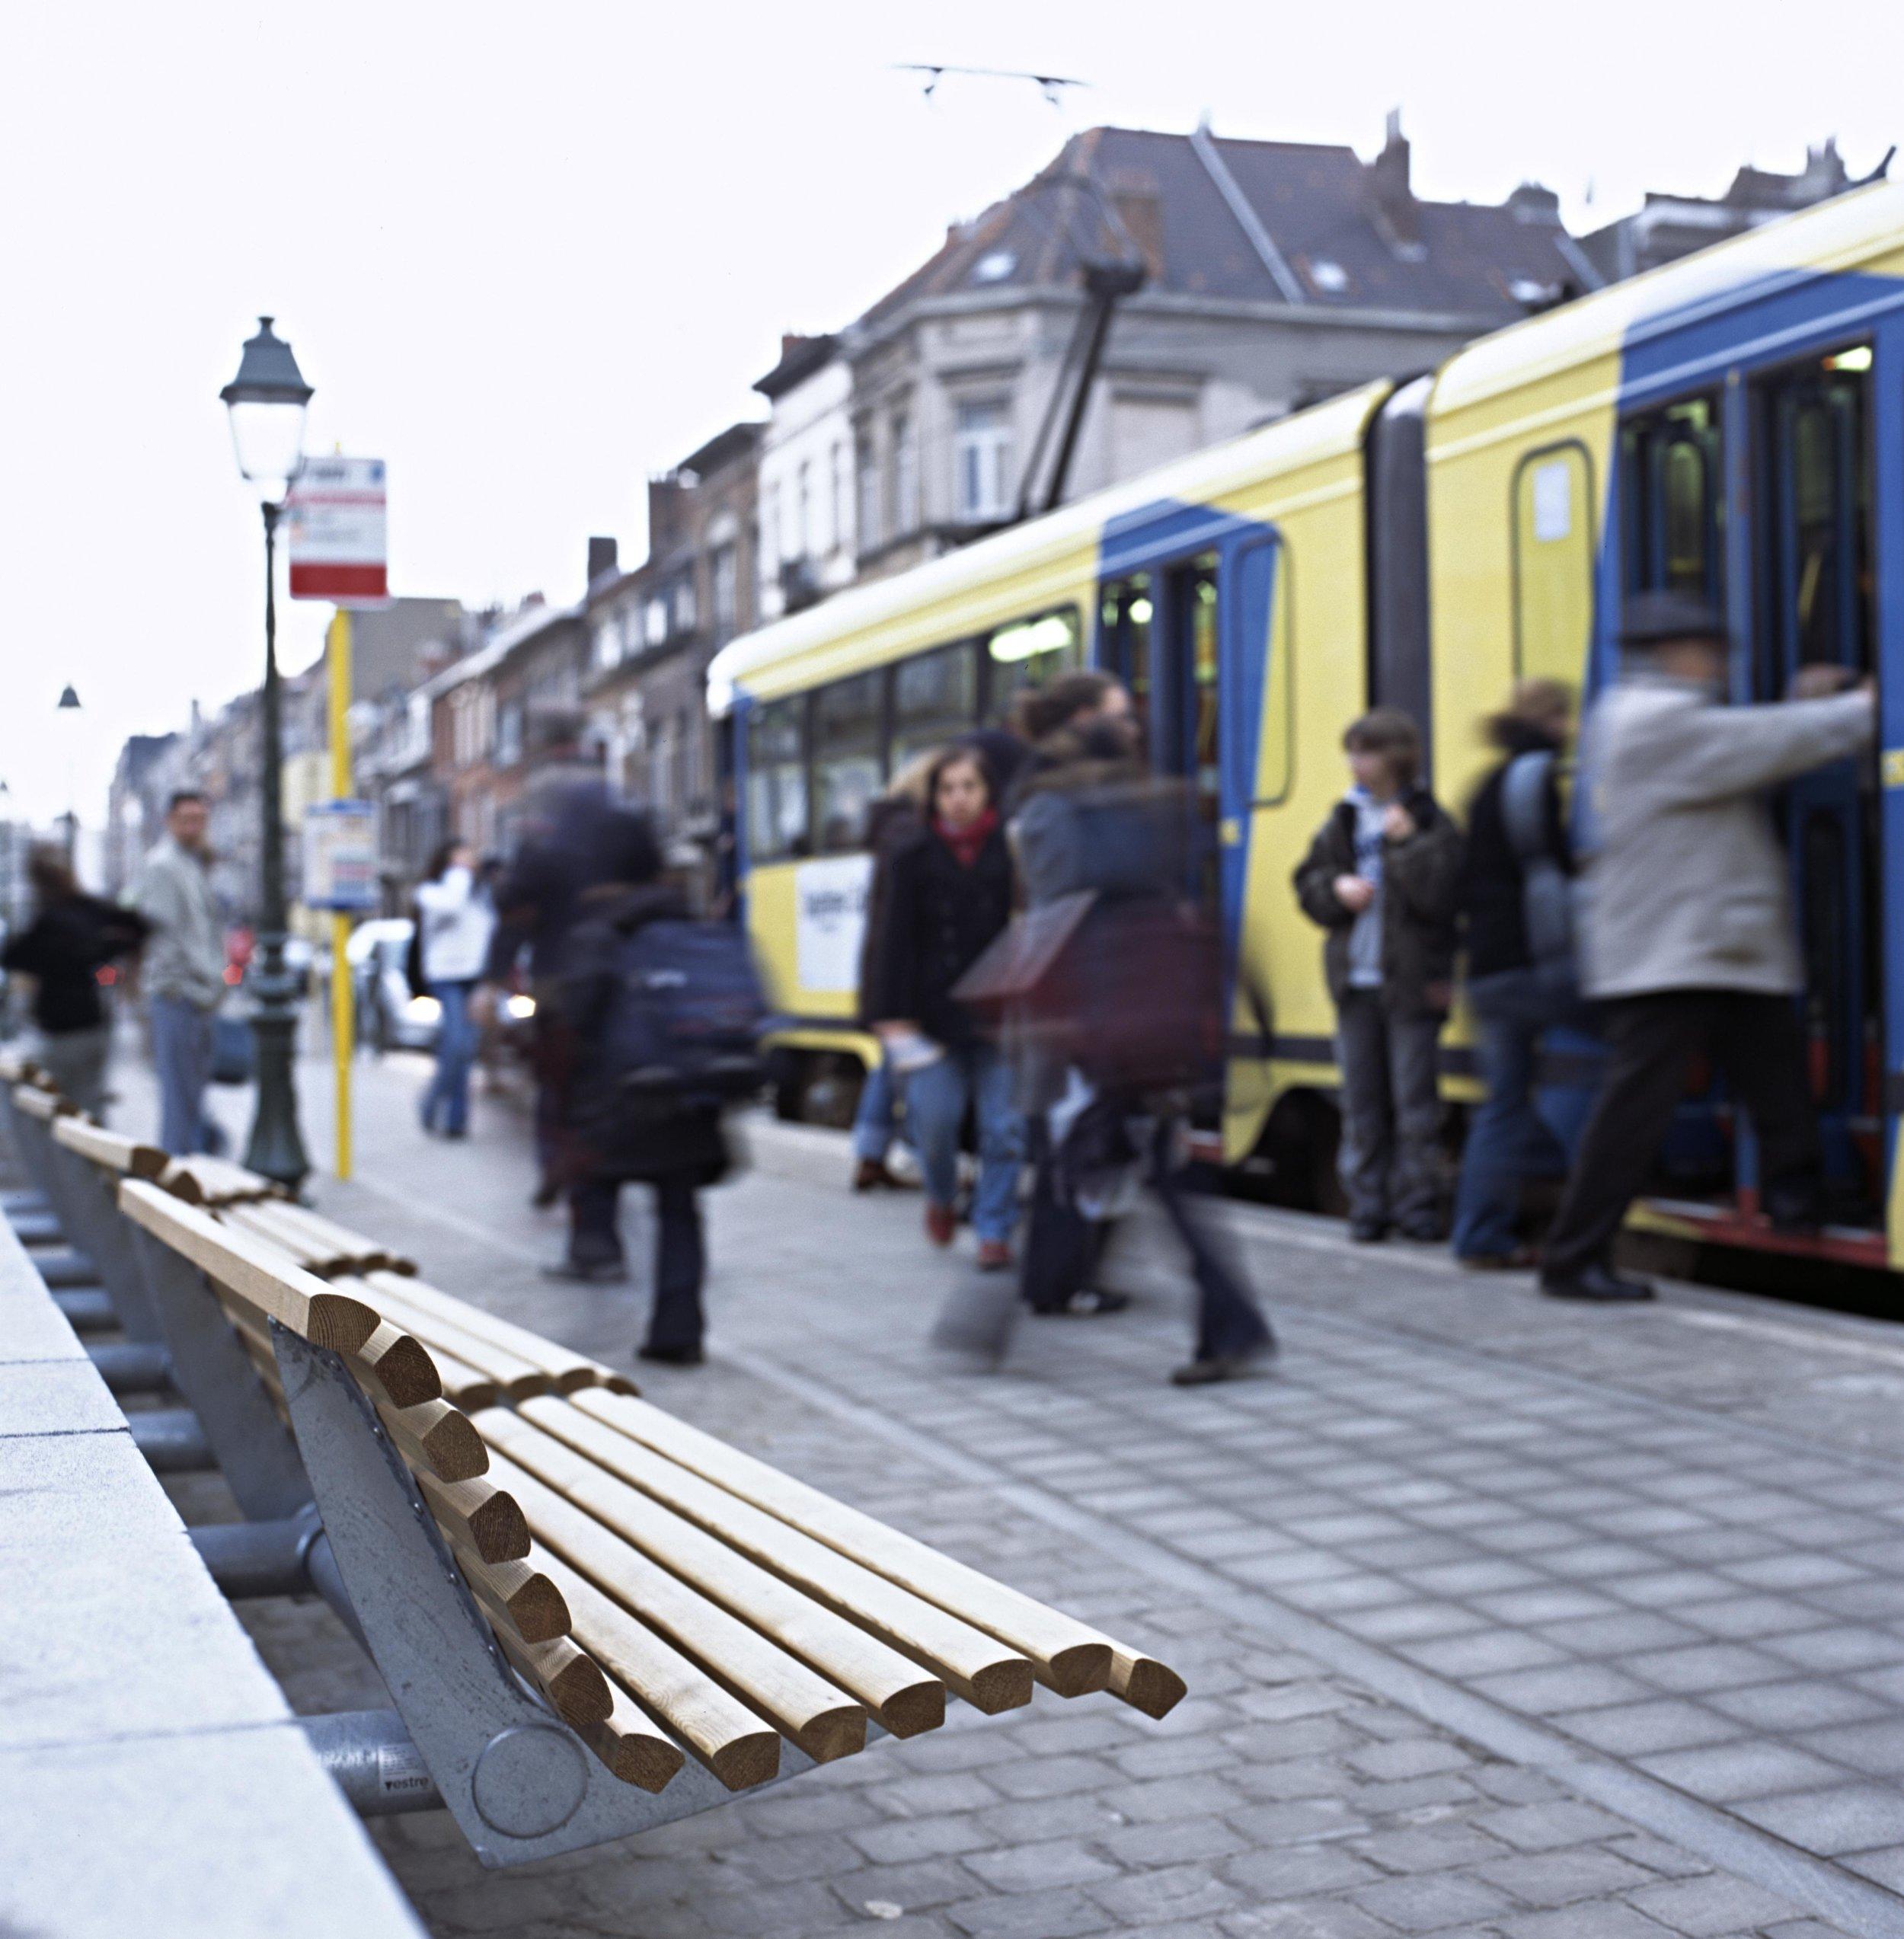 URBAN – denne serien bymøbler har preget uterom både i og utenfor Norge i mange år. Her avbildet i Brussel. Foto: Vestre Street Furniture